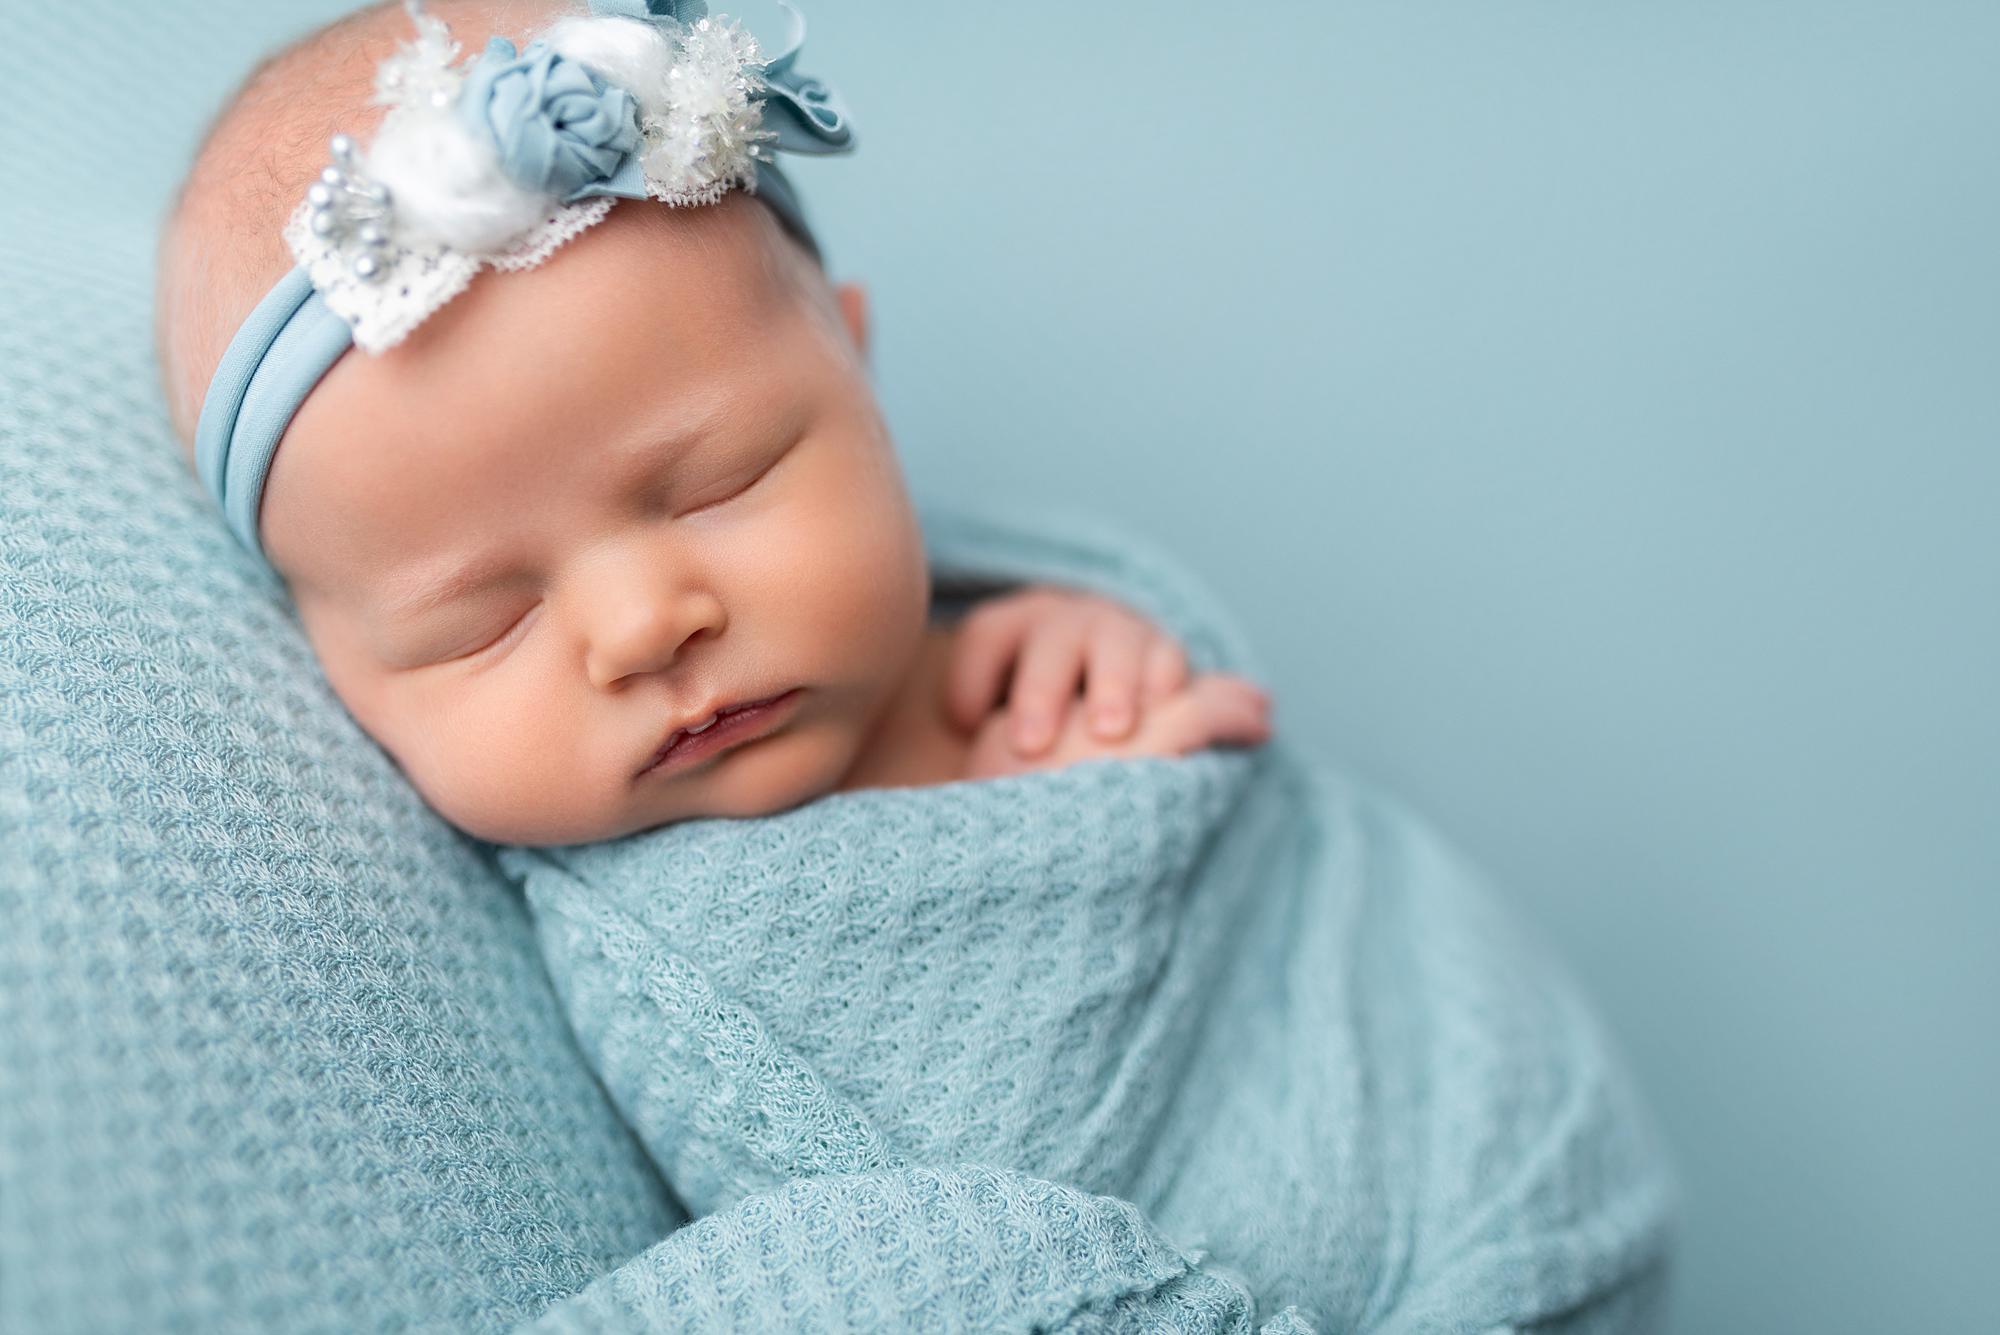 A sleeping newborn baby